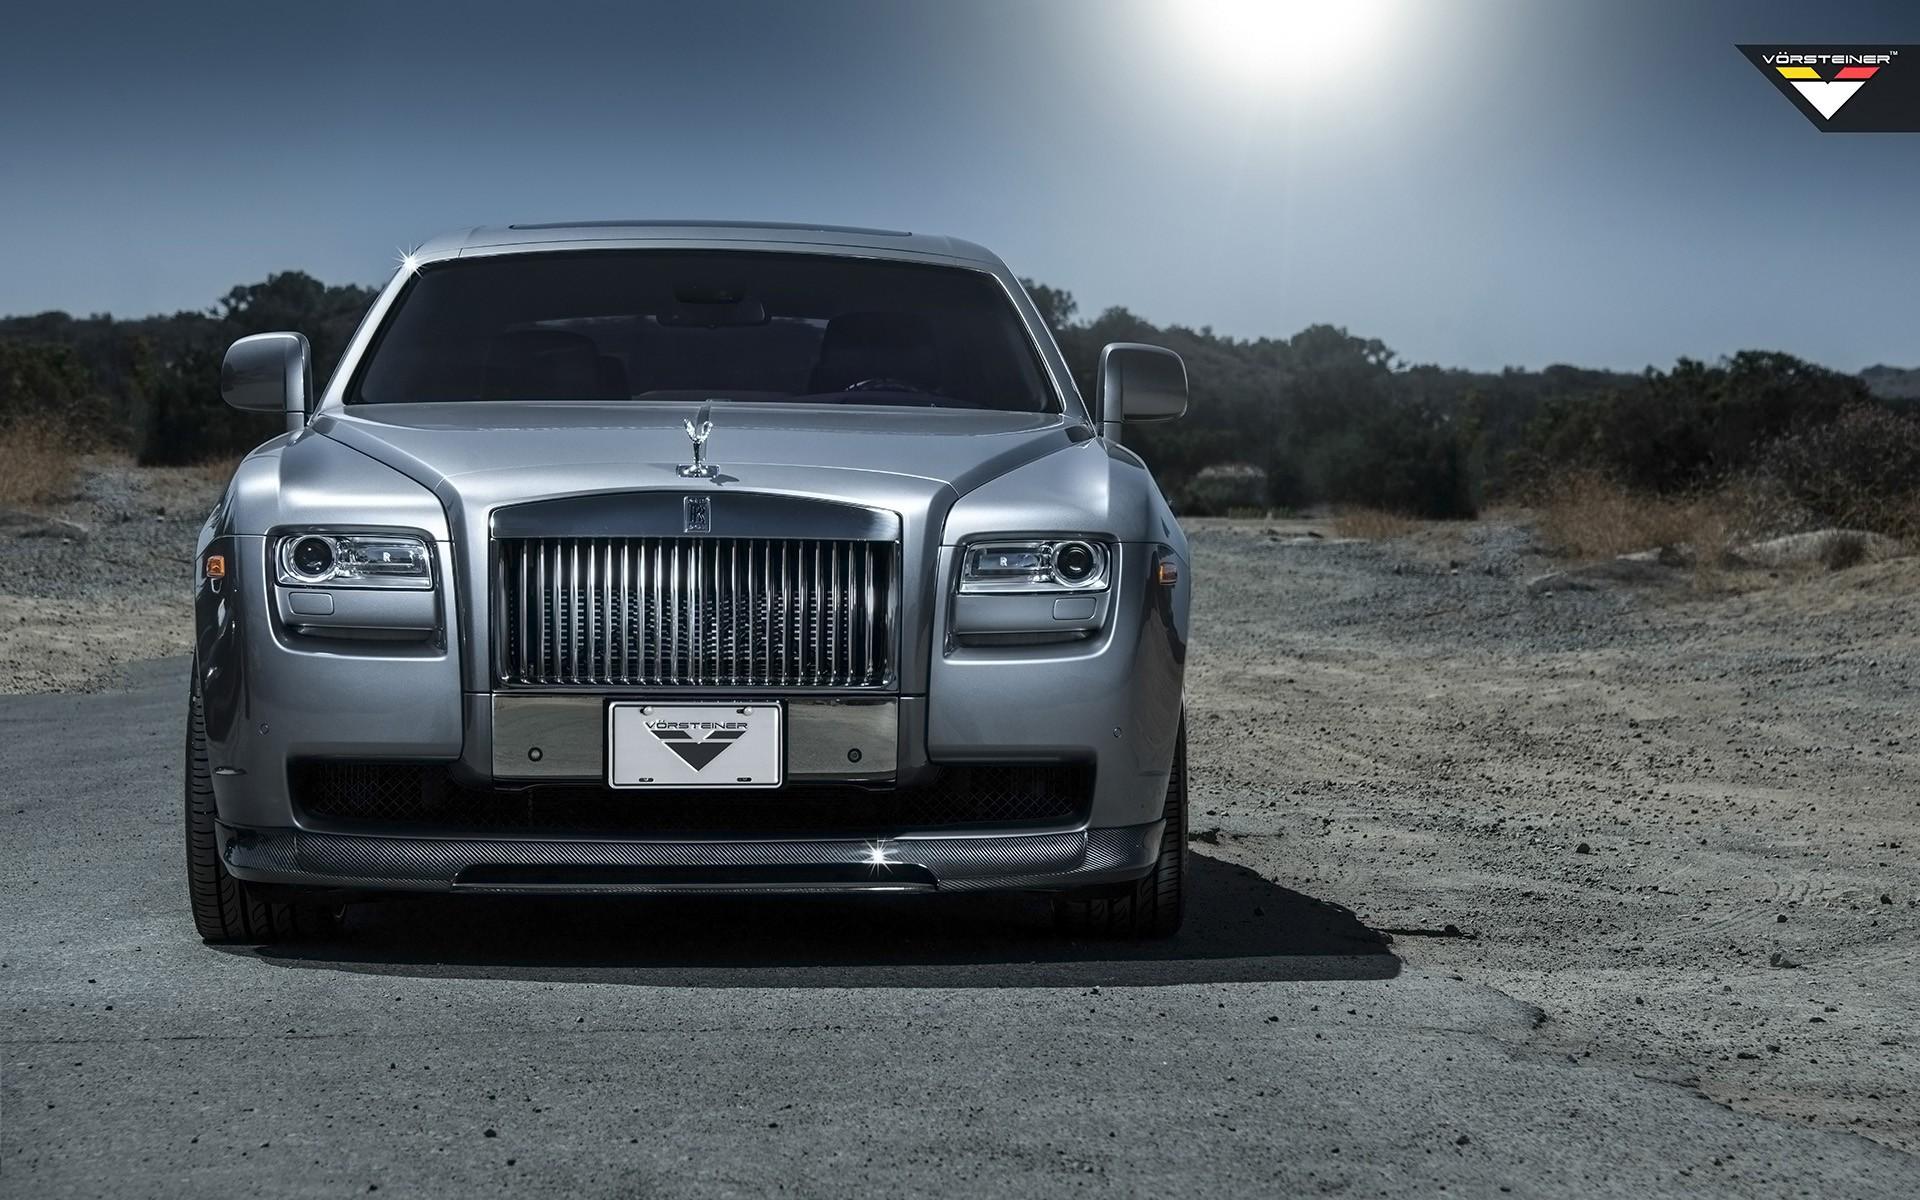 2014 vorsteiner rolls royce ghost silver wallpaper hd - Royal royce car wallpaper ...